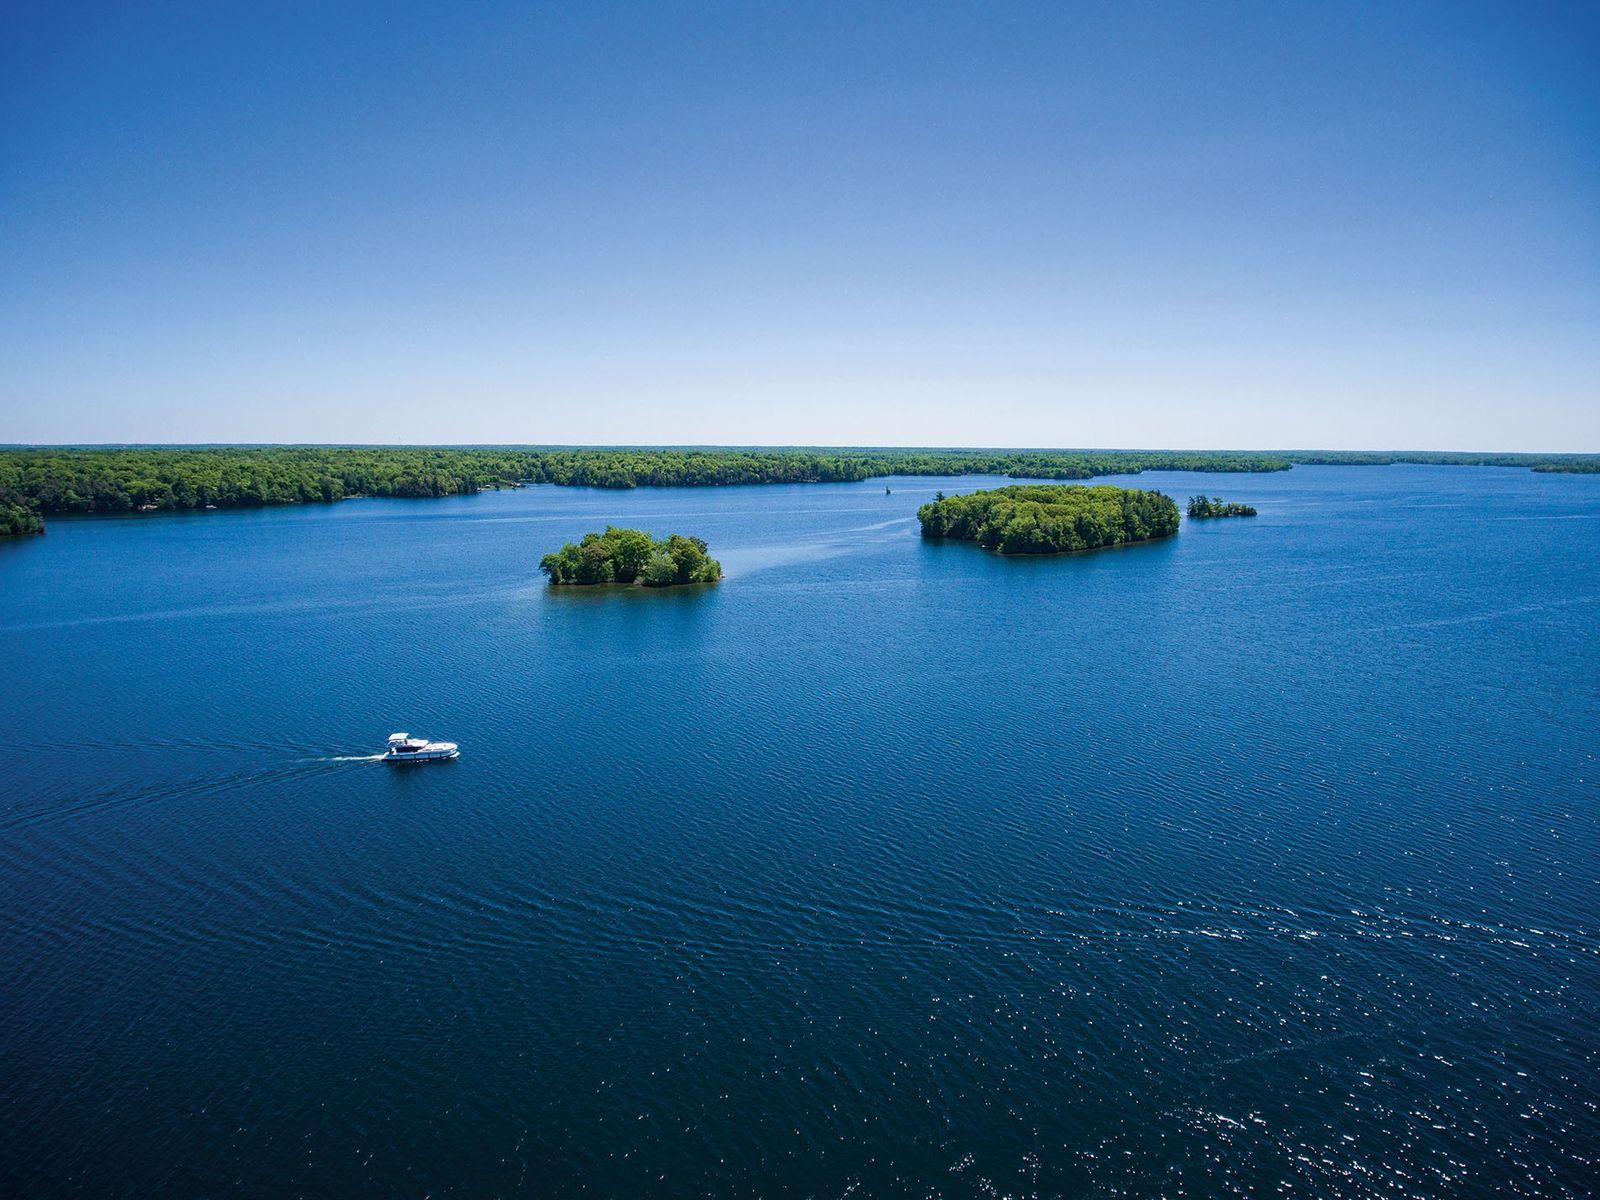 Upper Rideau Lake, Ontario, Canada